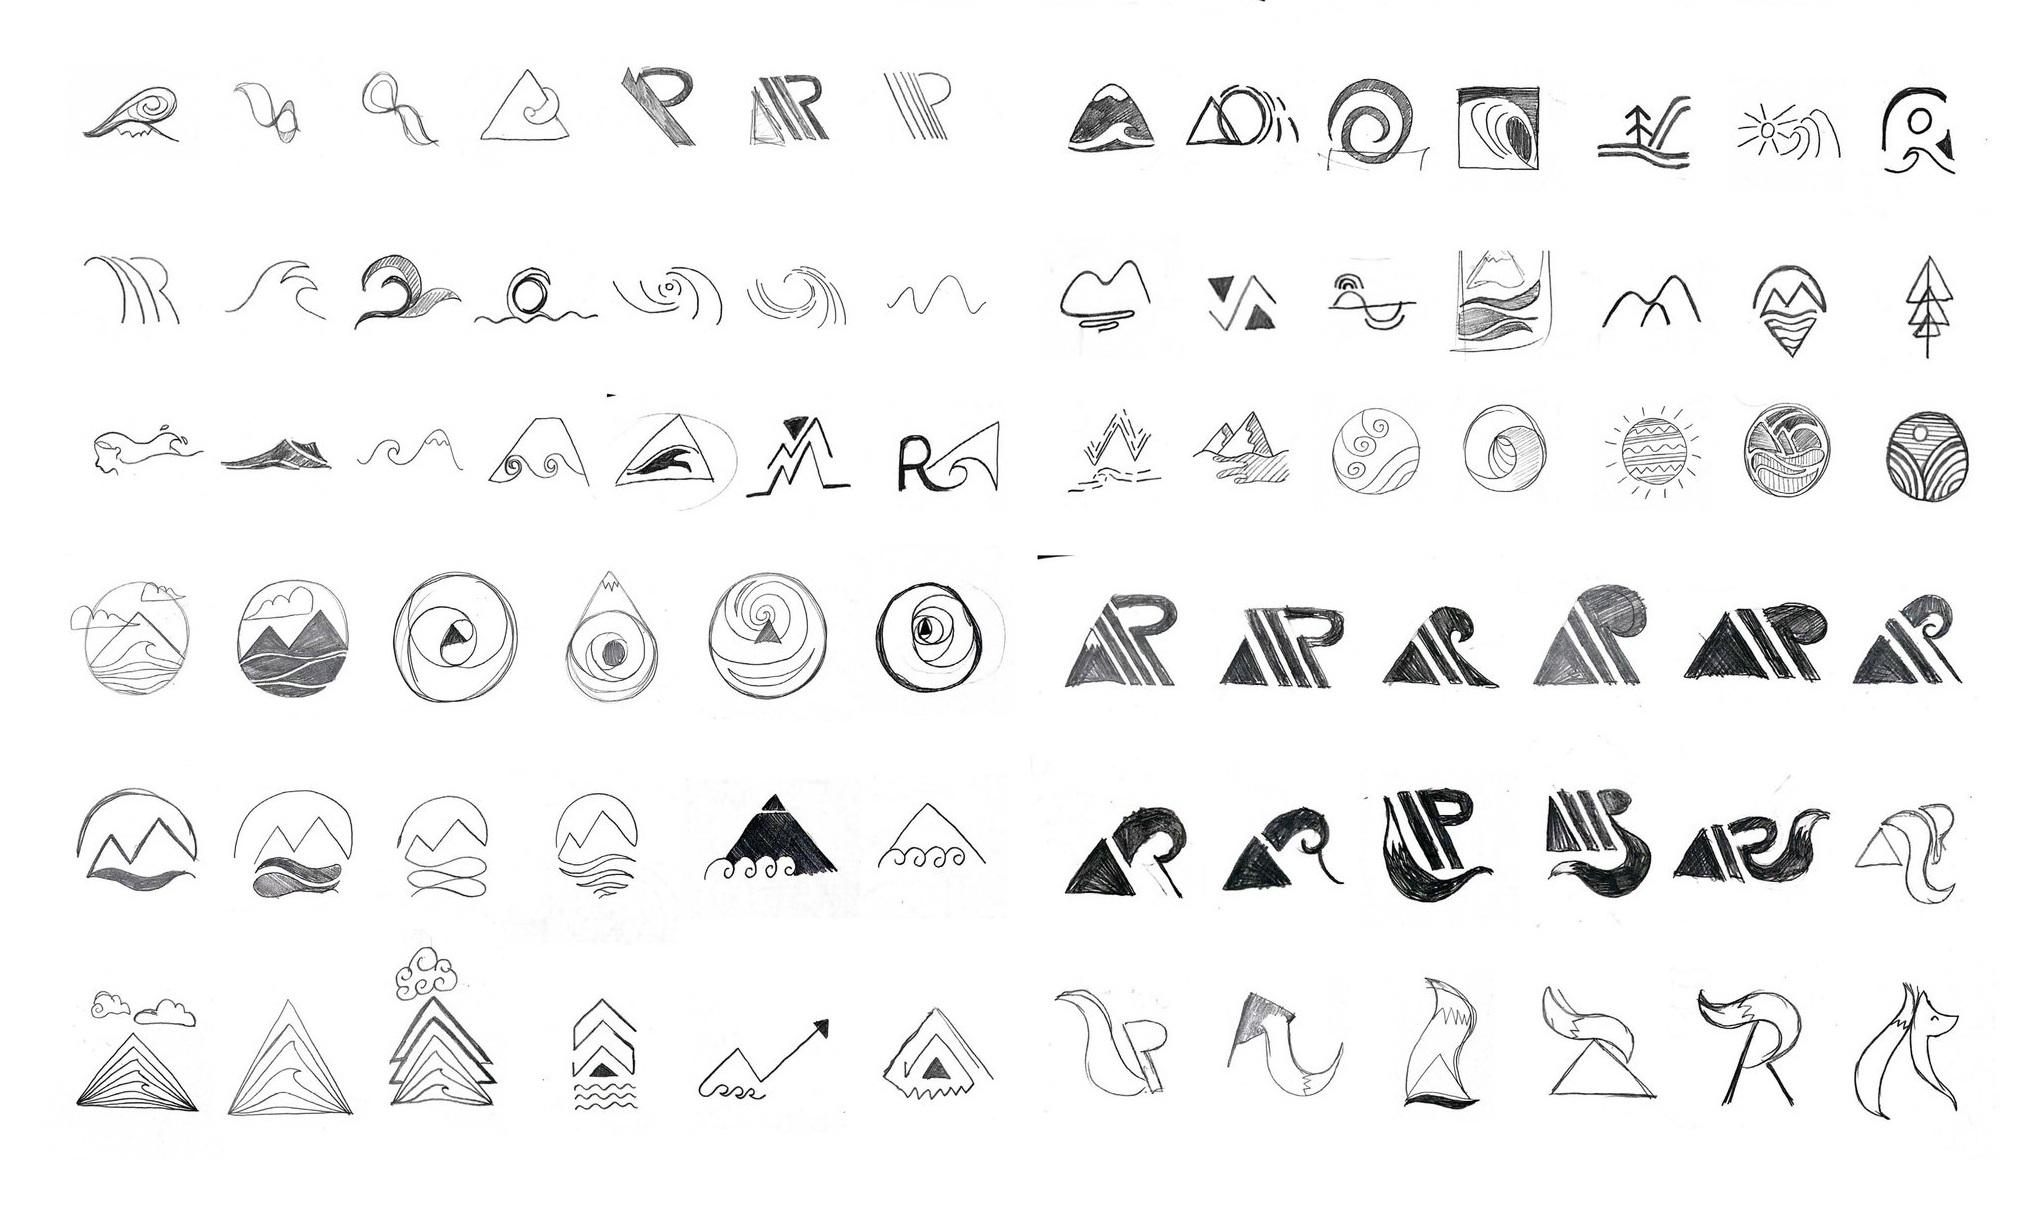 logo%2Bsketch.jpg